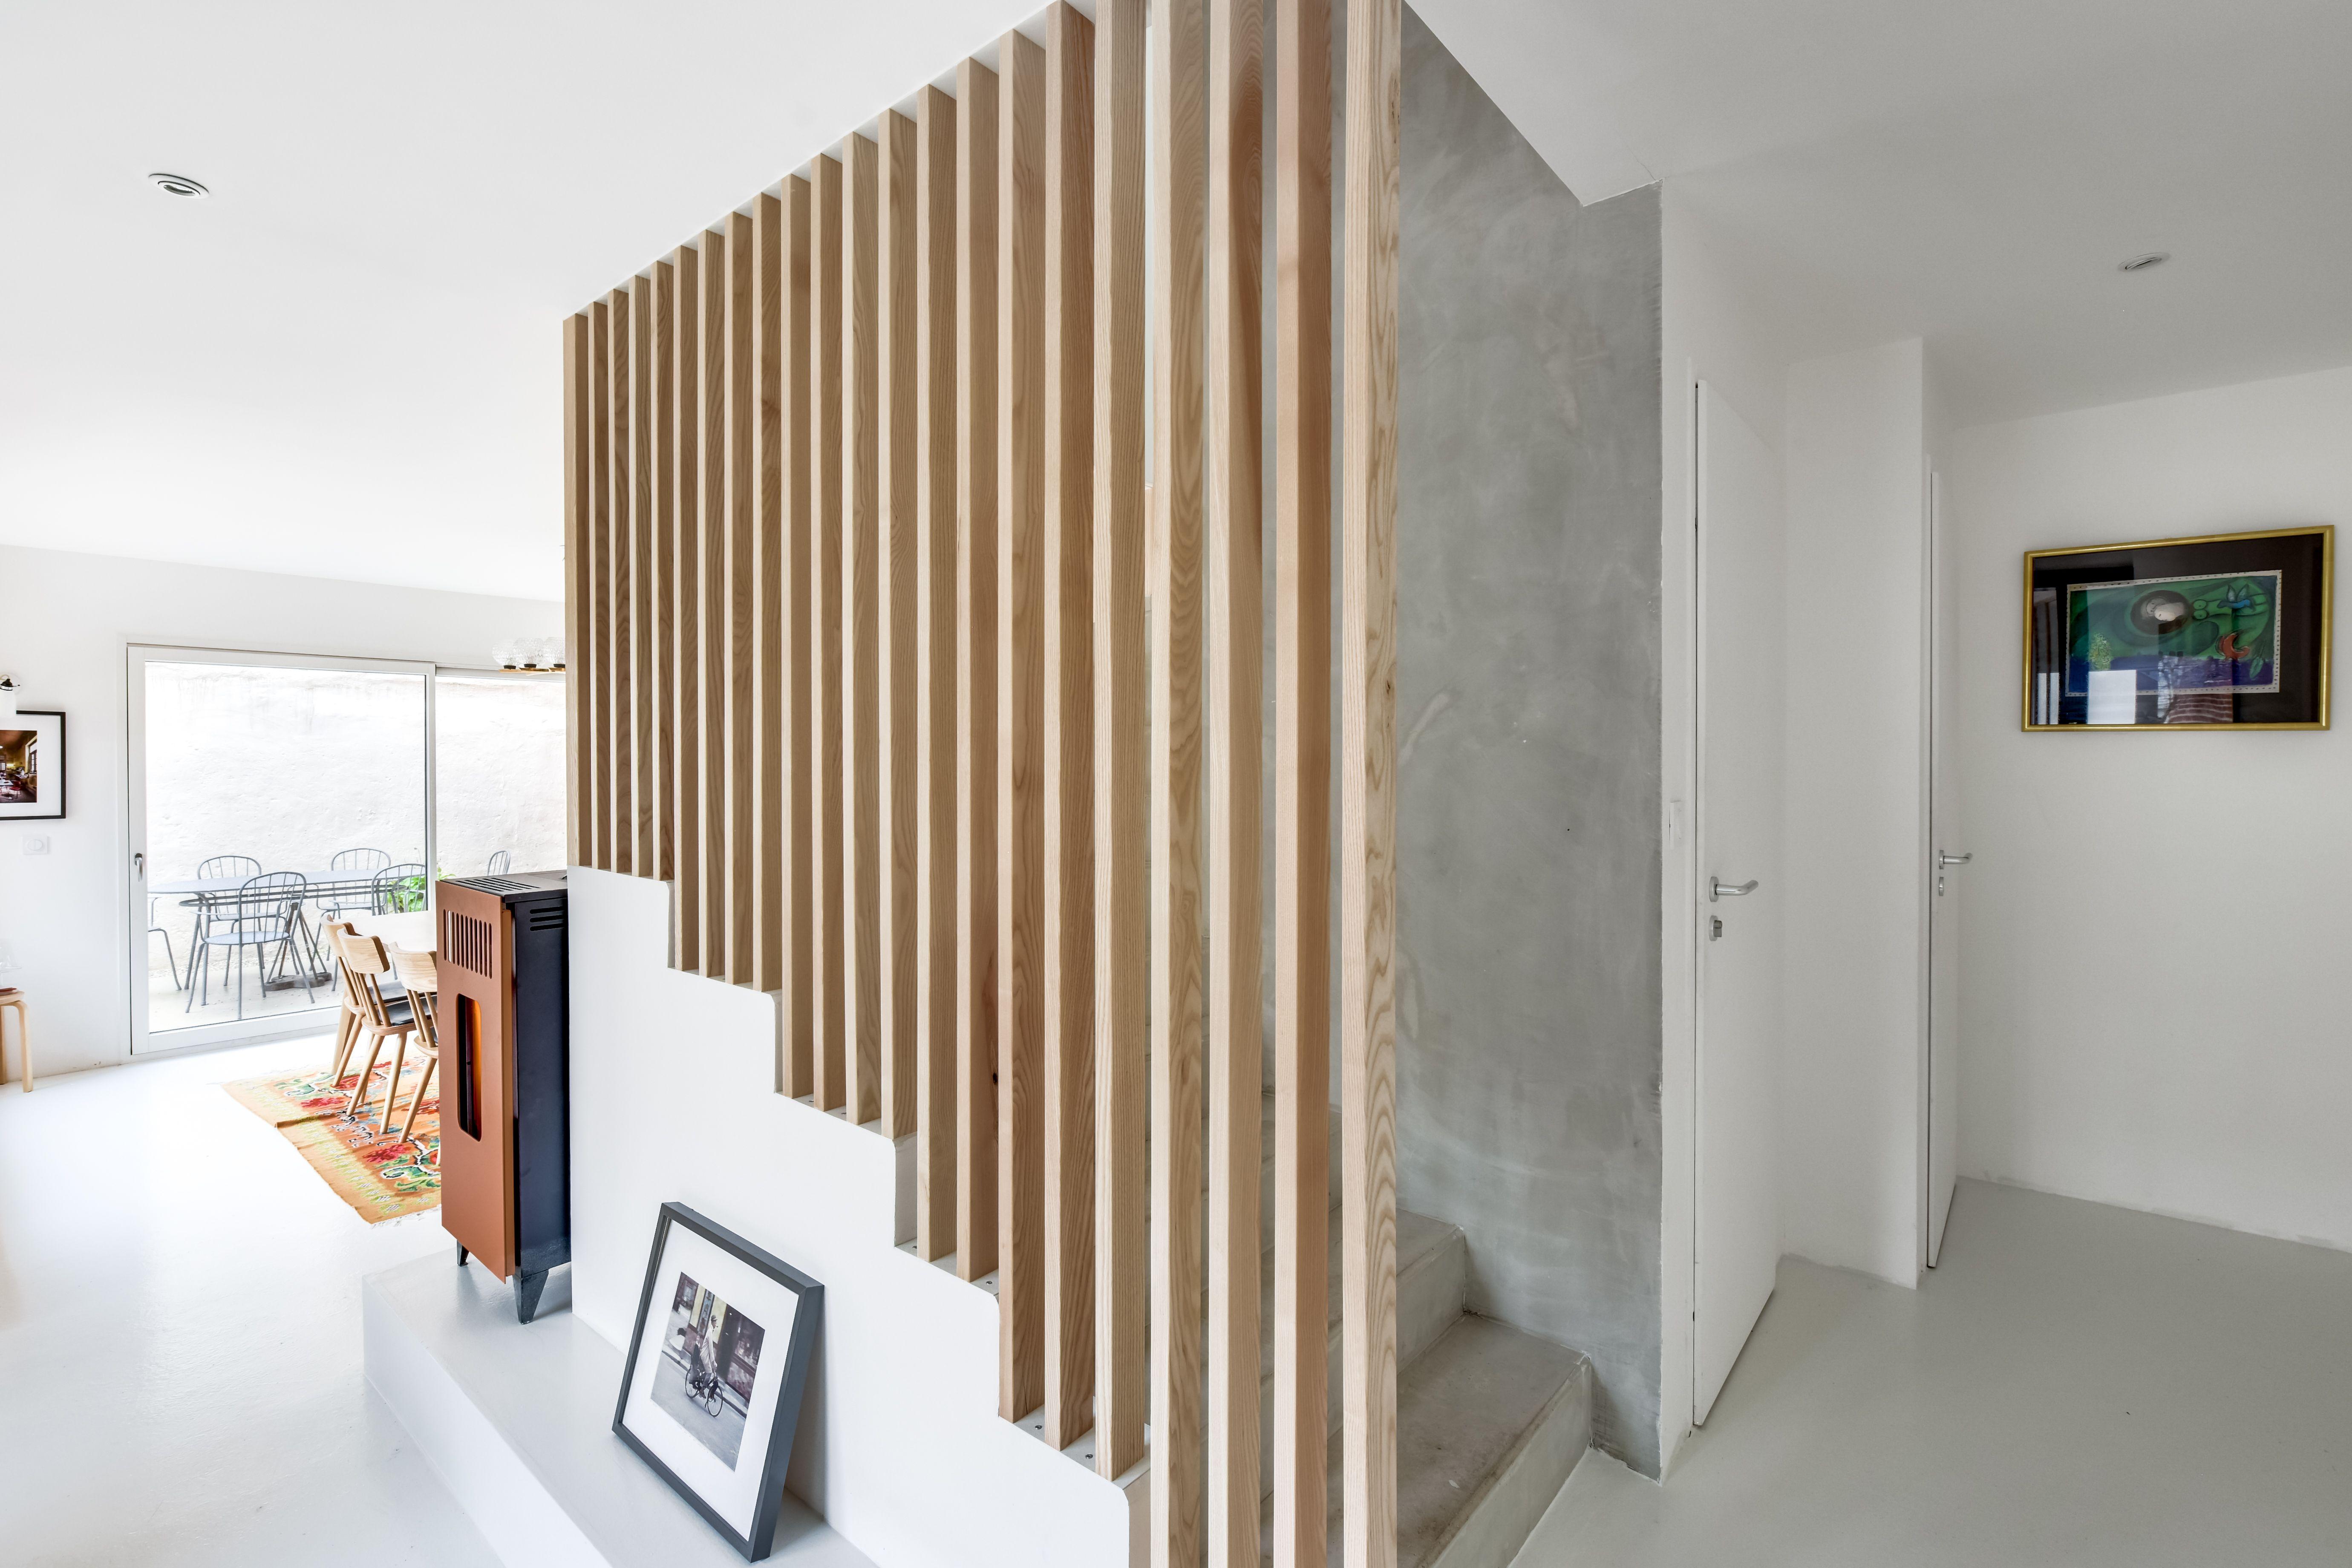 escalier b ton brut tasseaux bois stairs pinterest escadas. Black Bedroom Furniture Sets. Home Design Ideas